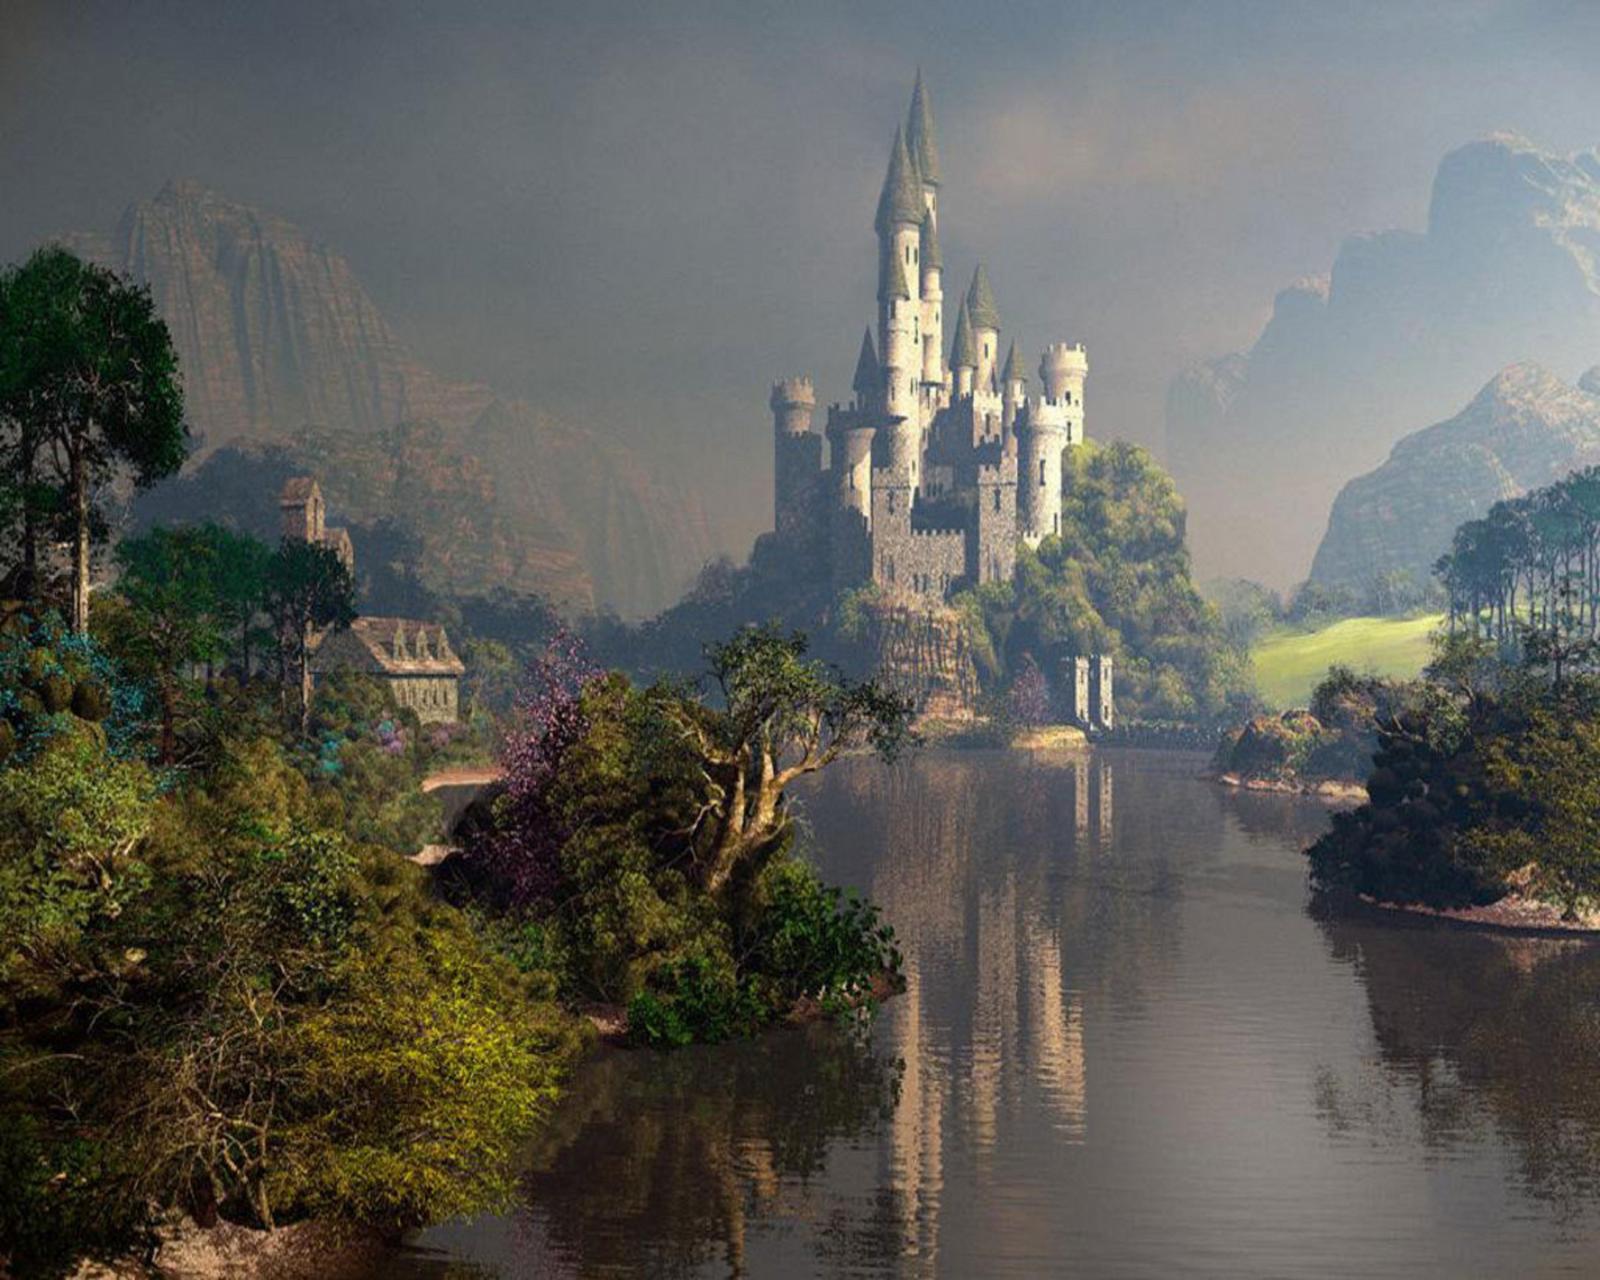 landscapes castles fantasy art - photo #41